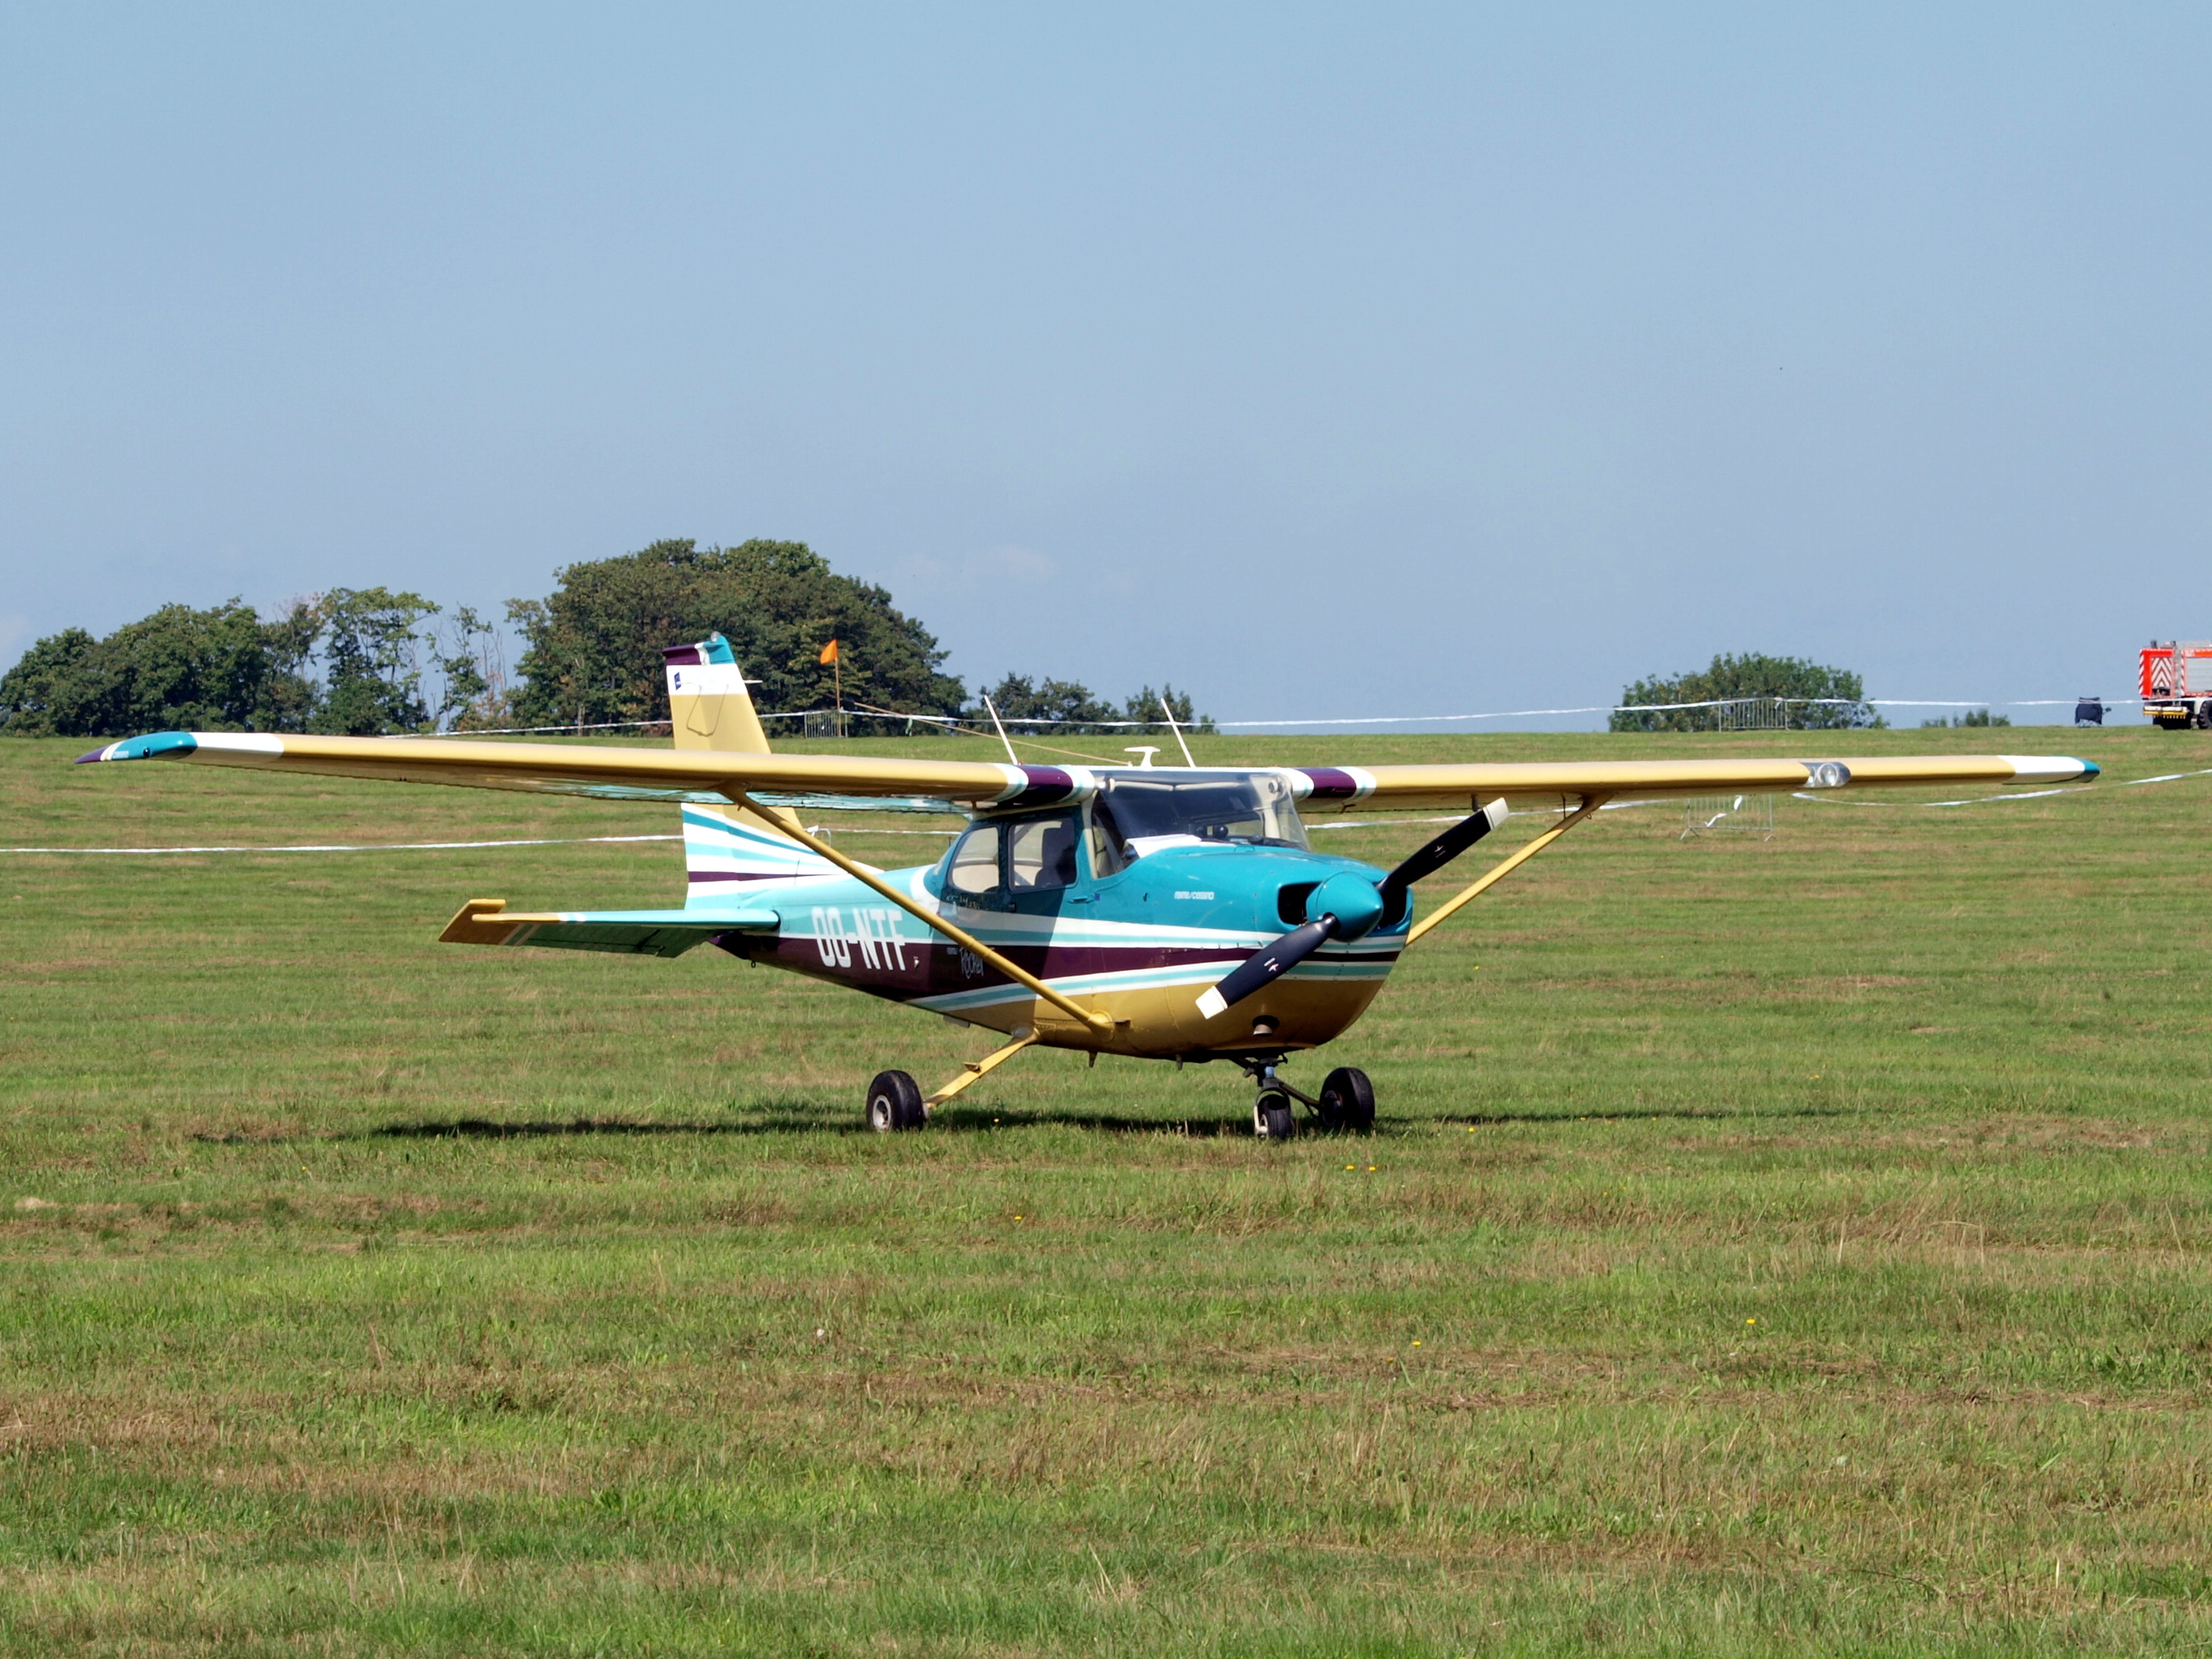 File:Cessna CFR172H Reims Rocket, OO-NTF.JPG